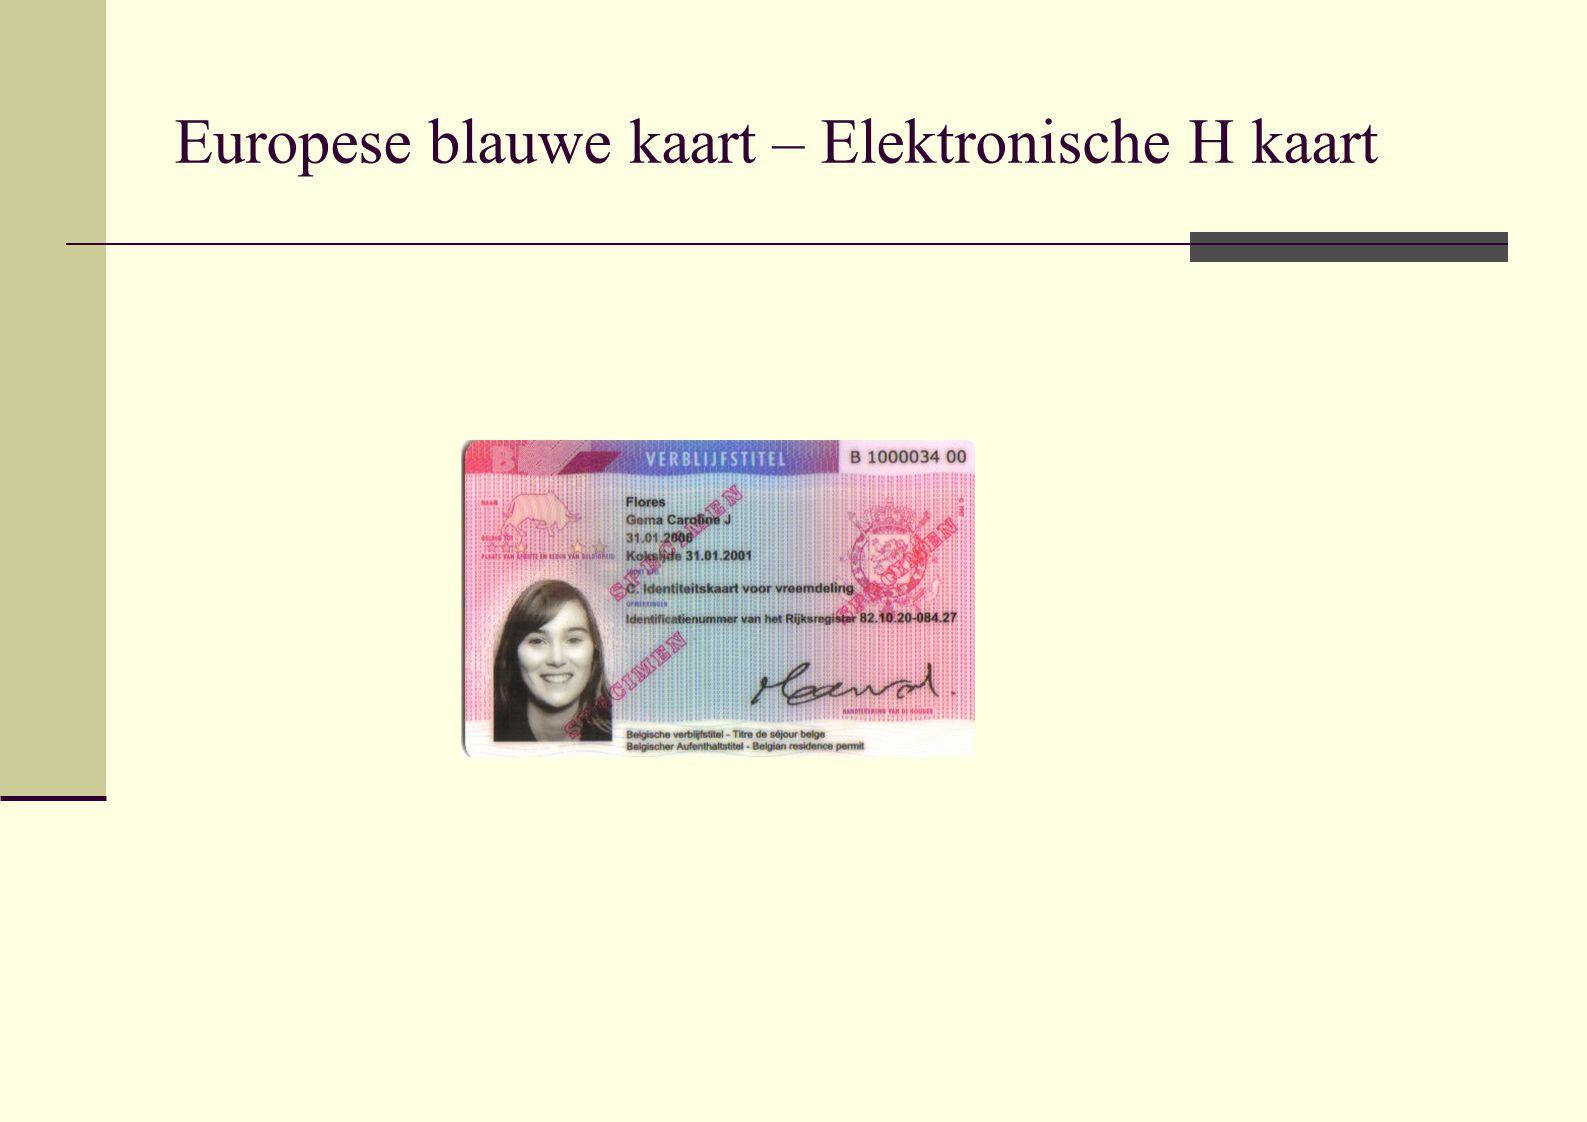 Europese blauwe kaart – Elektronische H kaart